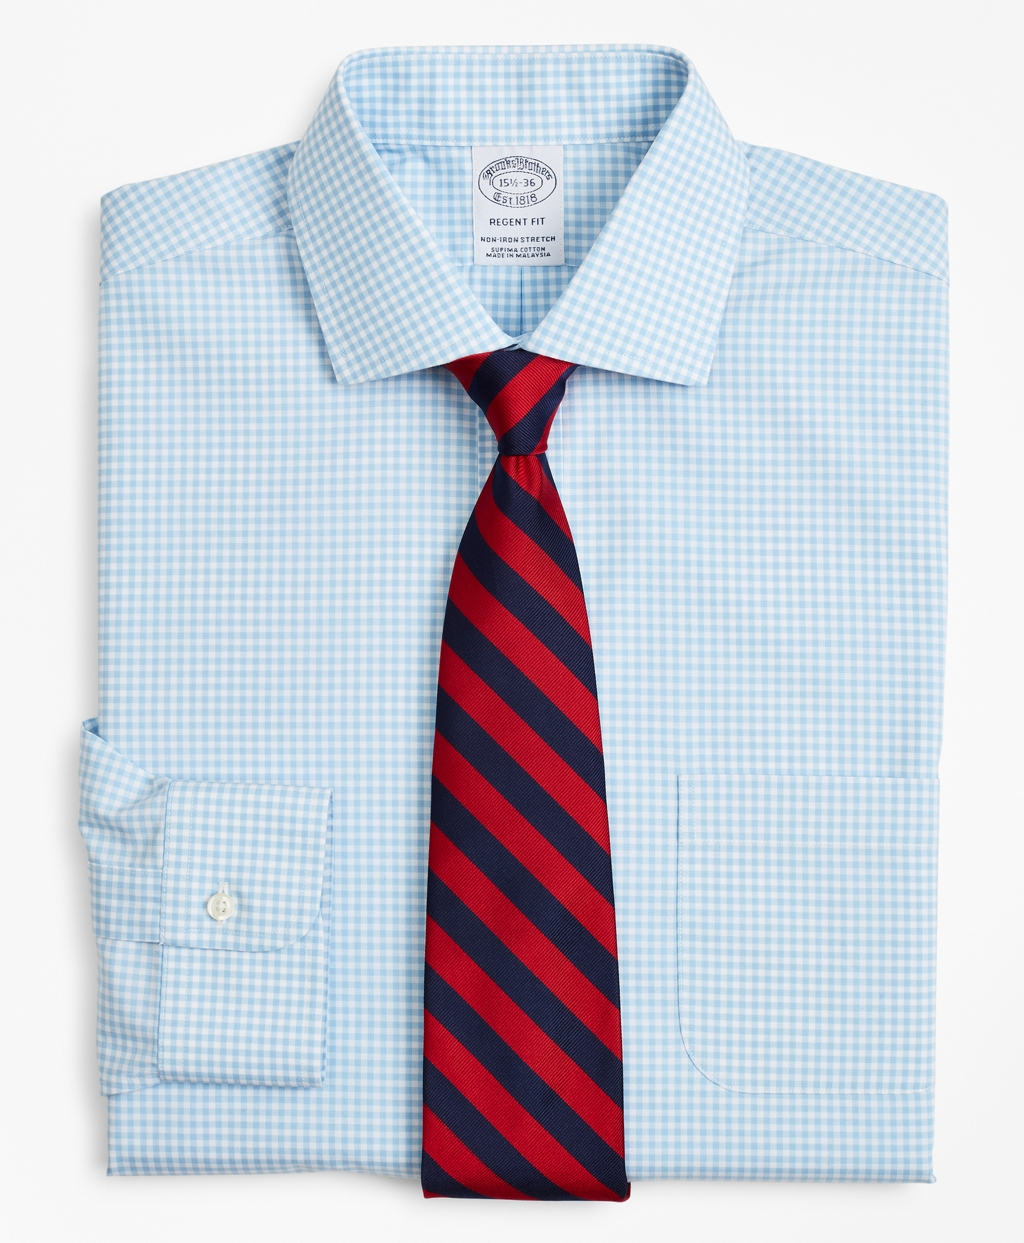 Brooksbrothers Stretch Regent Regular-Fit Dress Shirt, Non-Iron Poplin English Collar Gingham